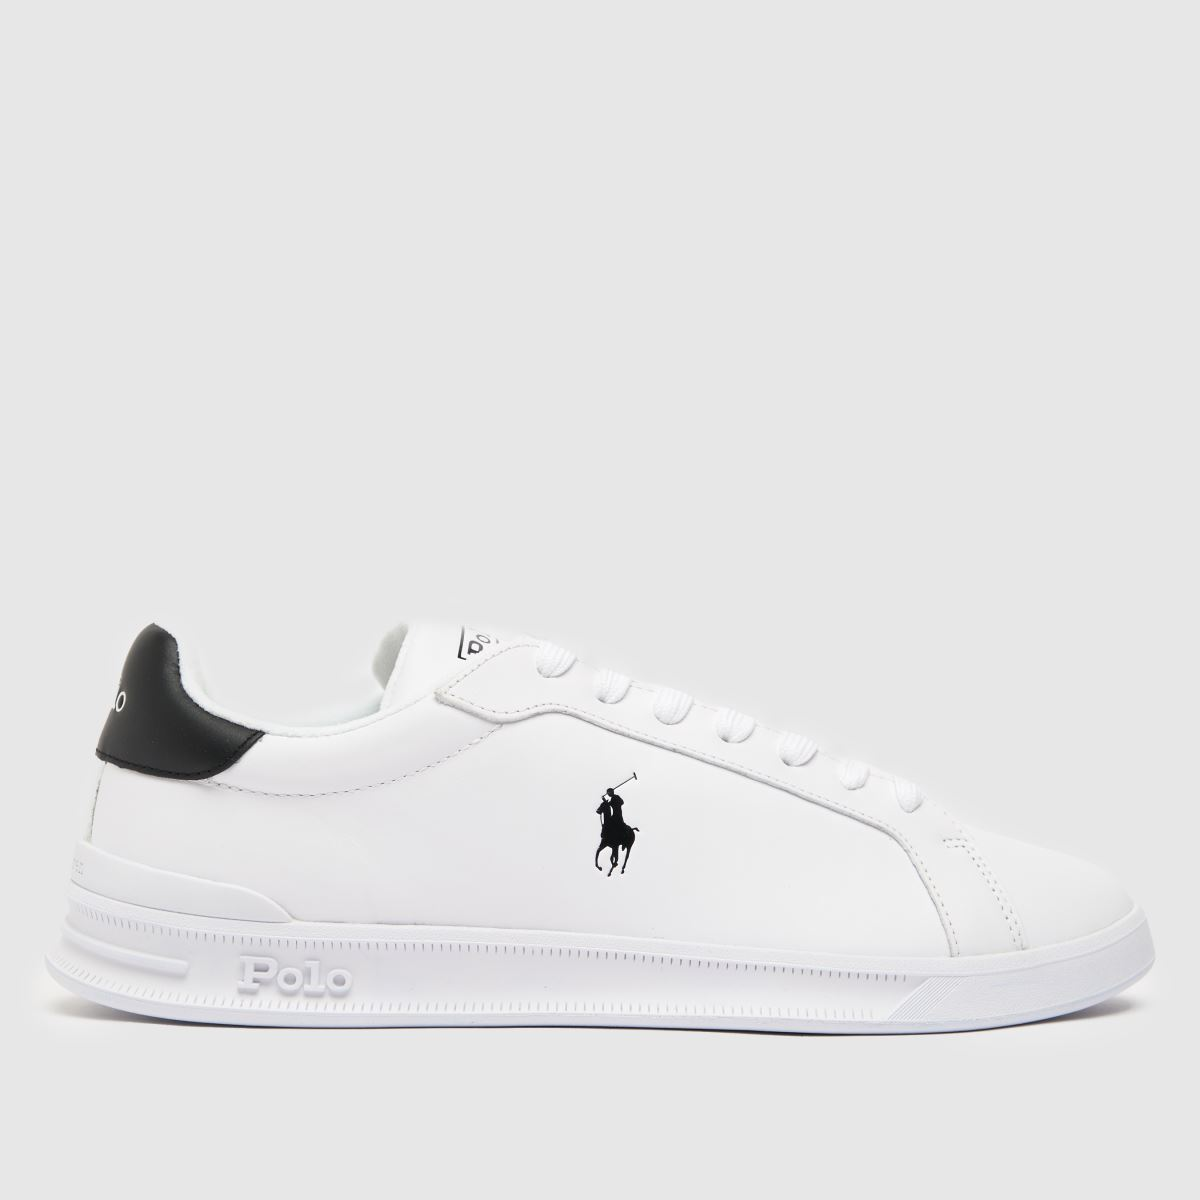 Polo Ralph Lauren White & Black Heritage Court Shoes